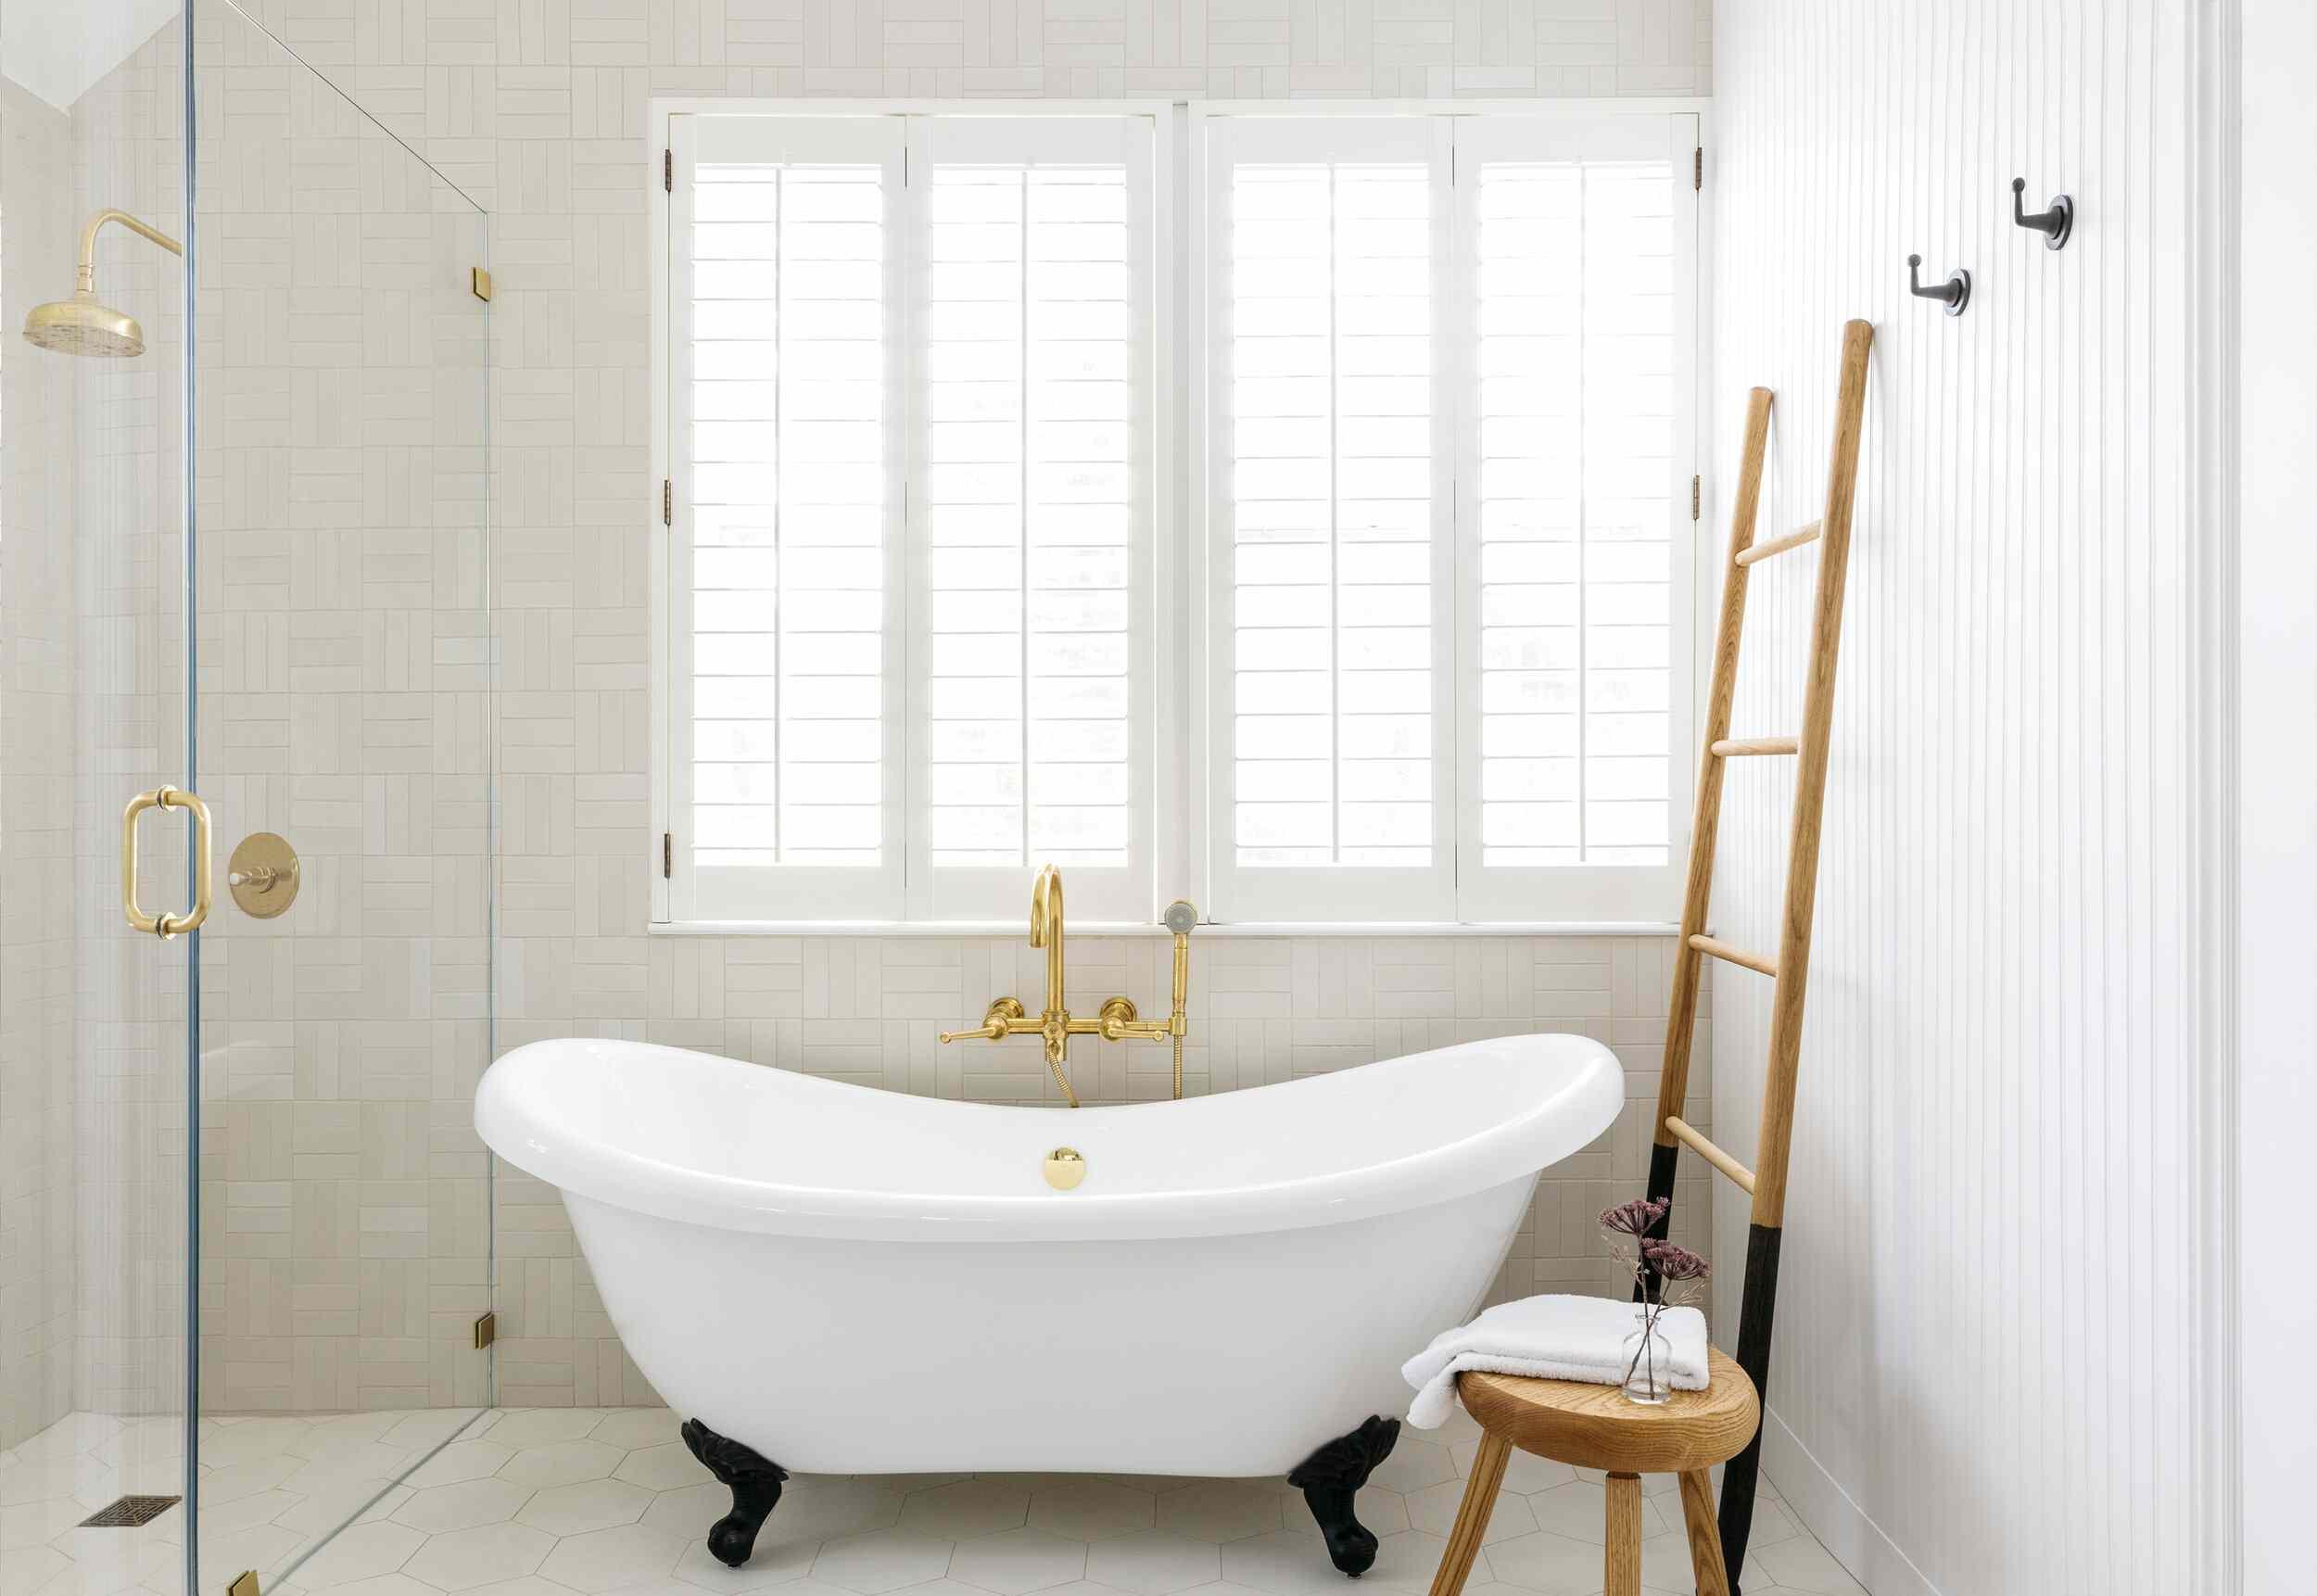 bathroom with clawfoot tub and ladder